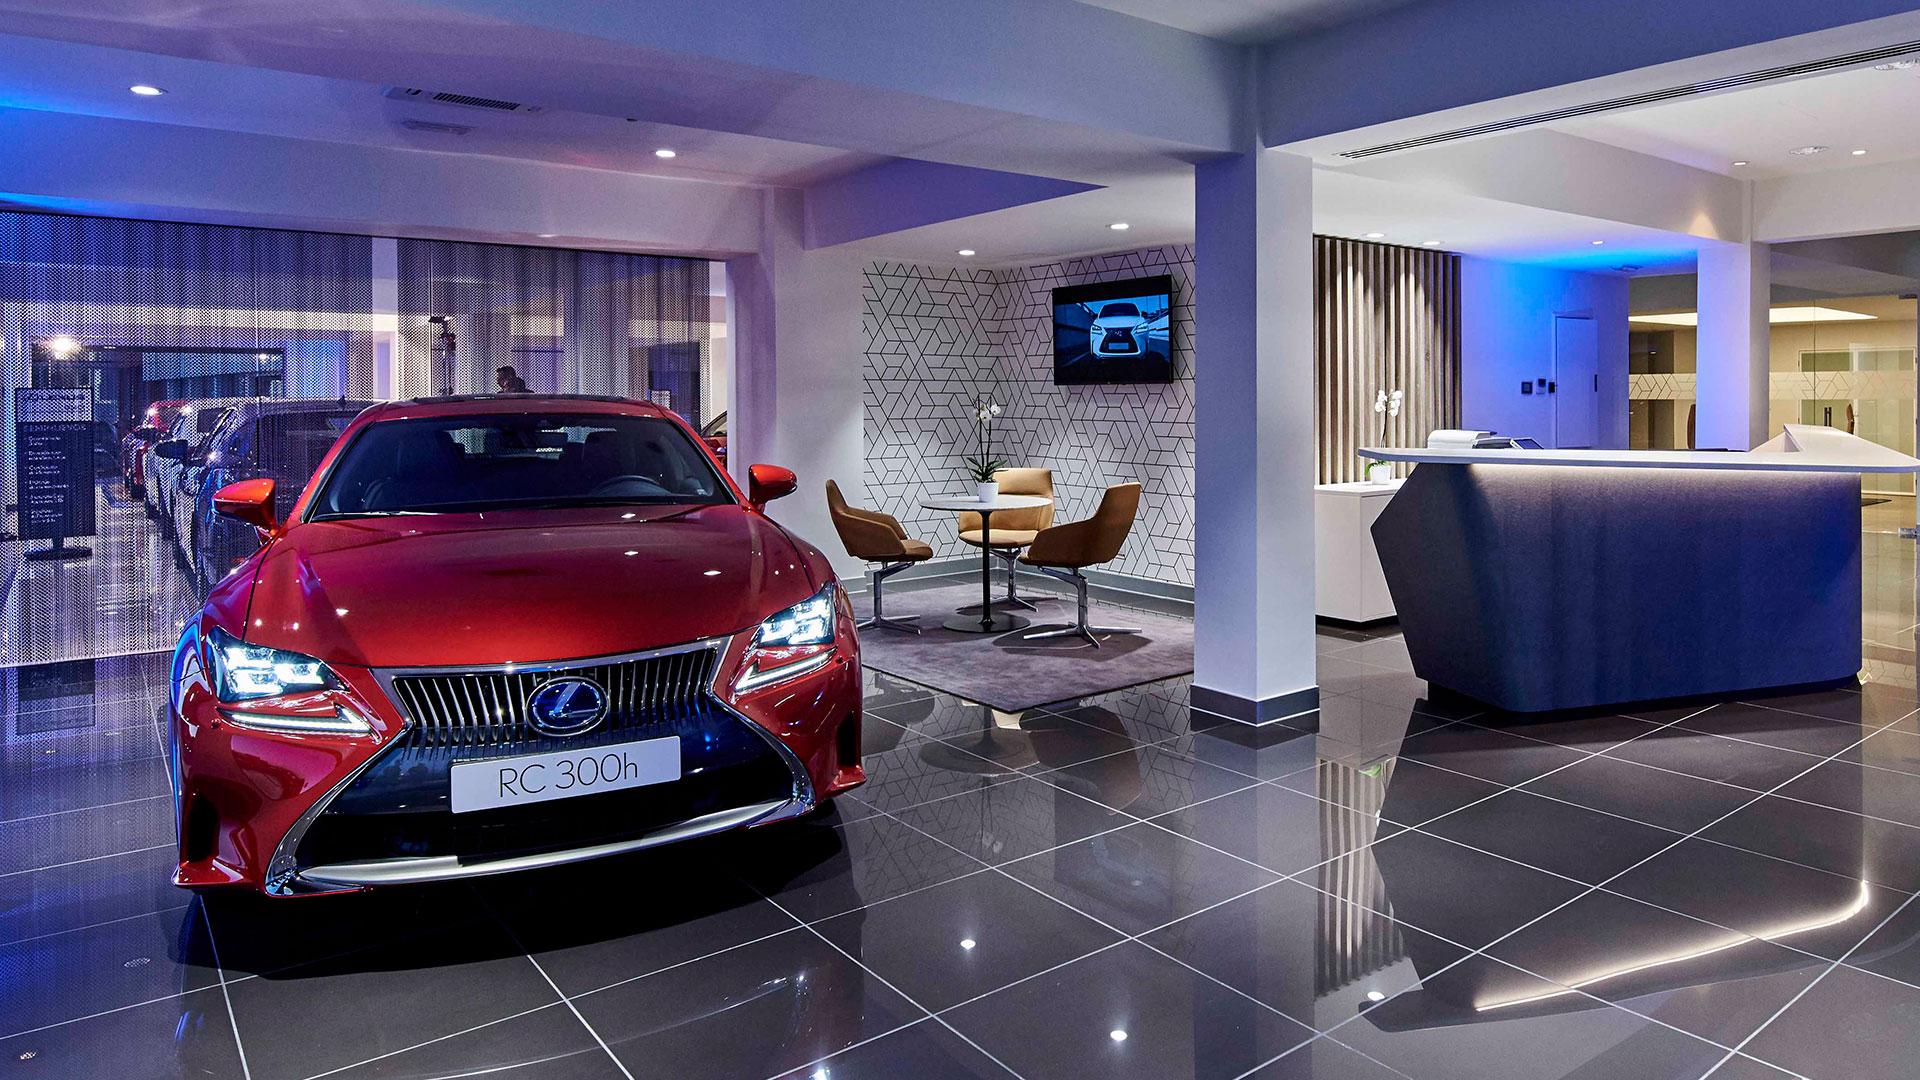 Lexus inaugura en La Coruña hero asset